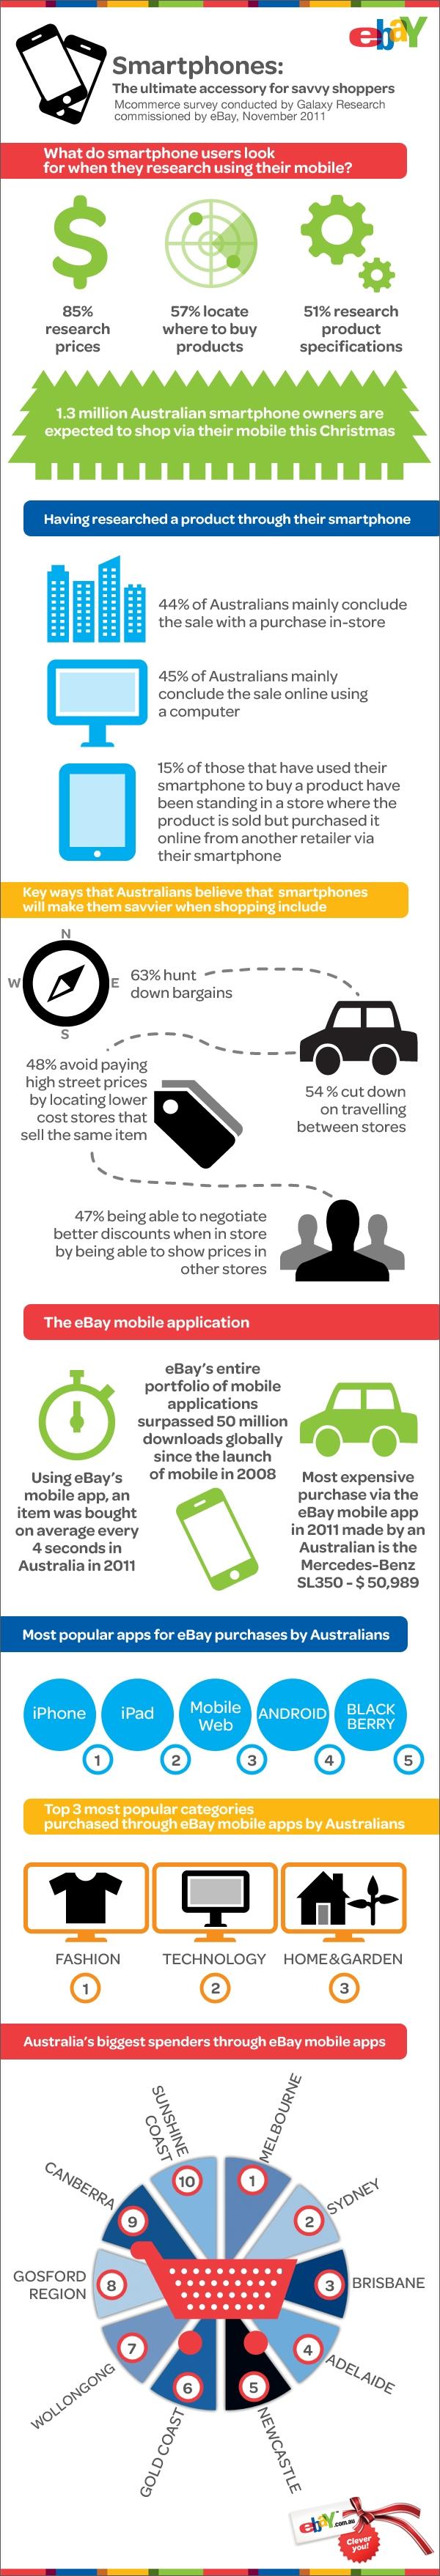 eBay infographic November 2011